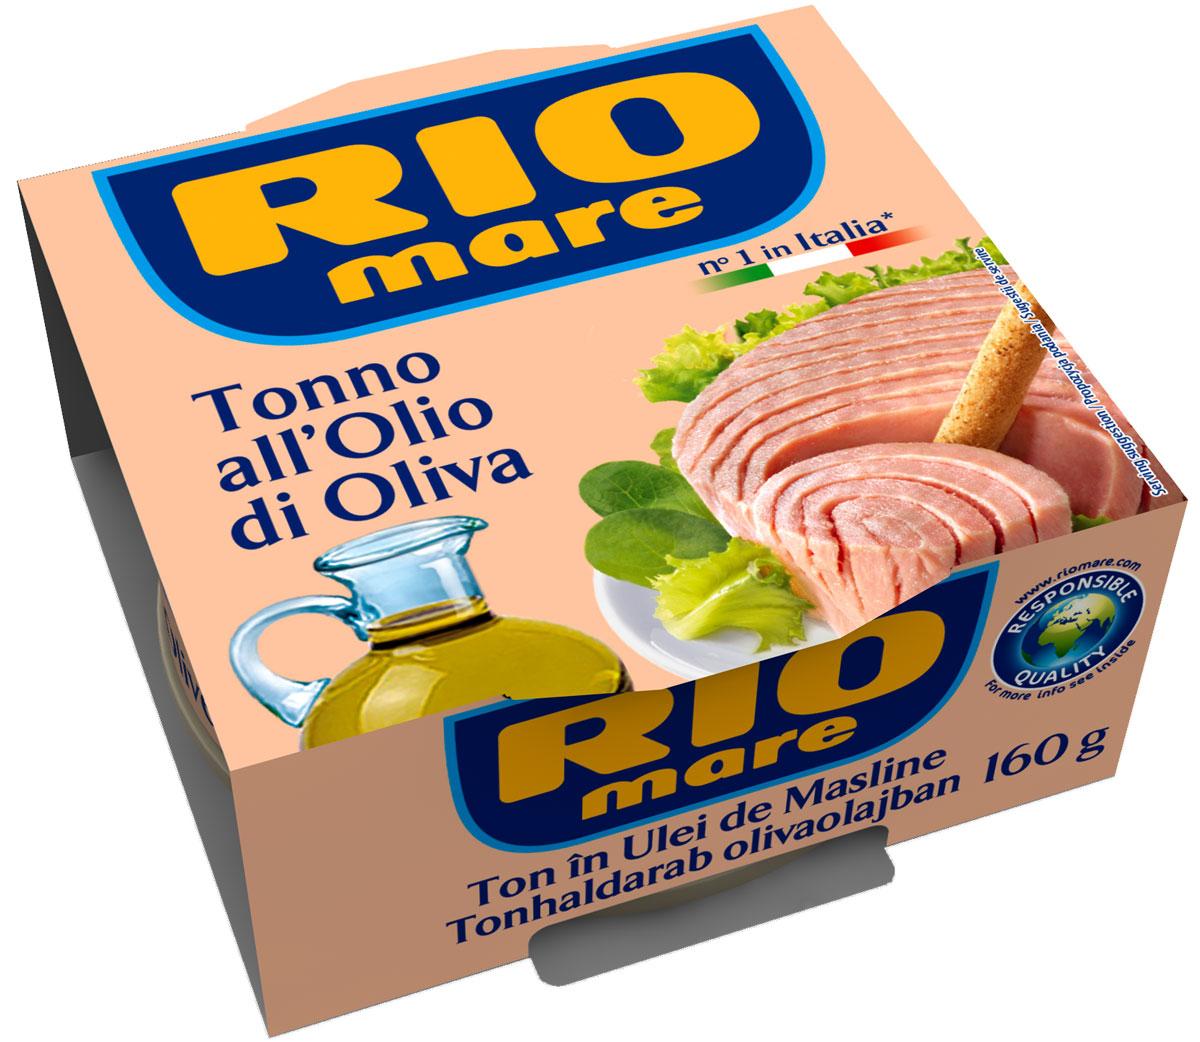 Rio Mare тунец в оливковом масле, 160 ггрс014